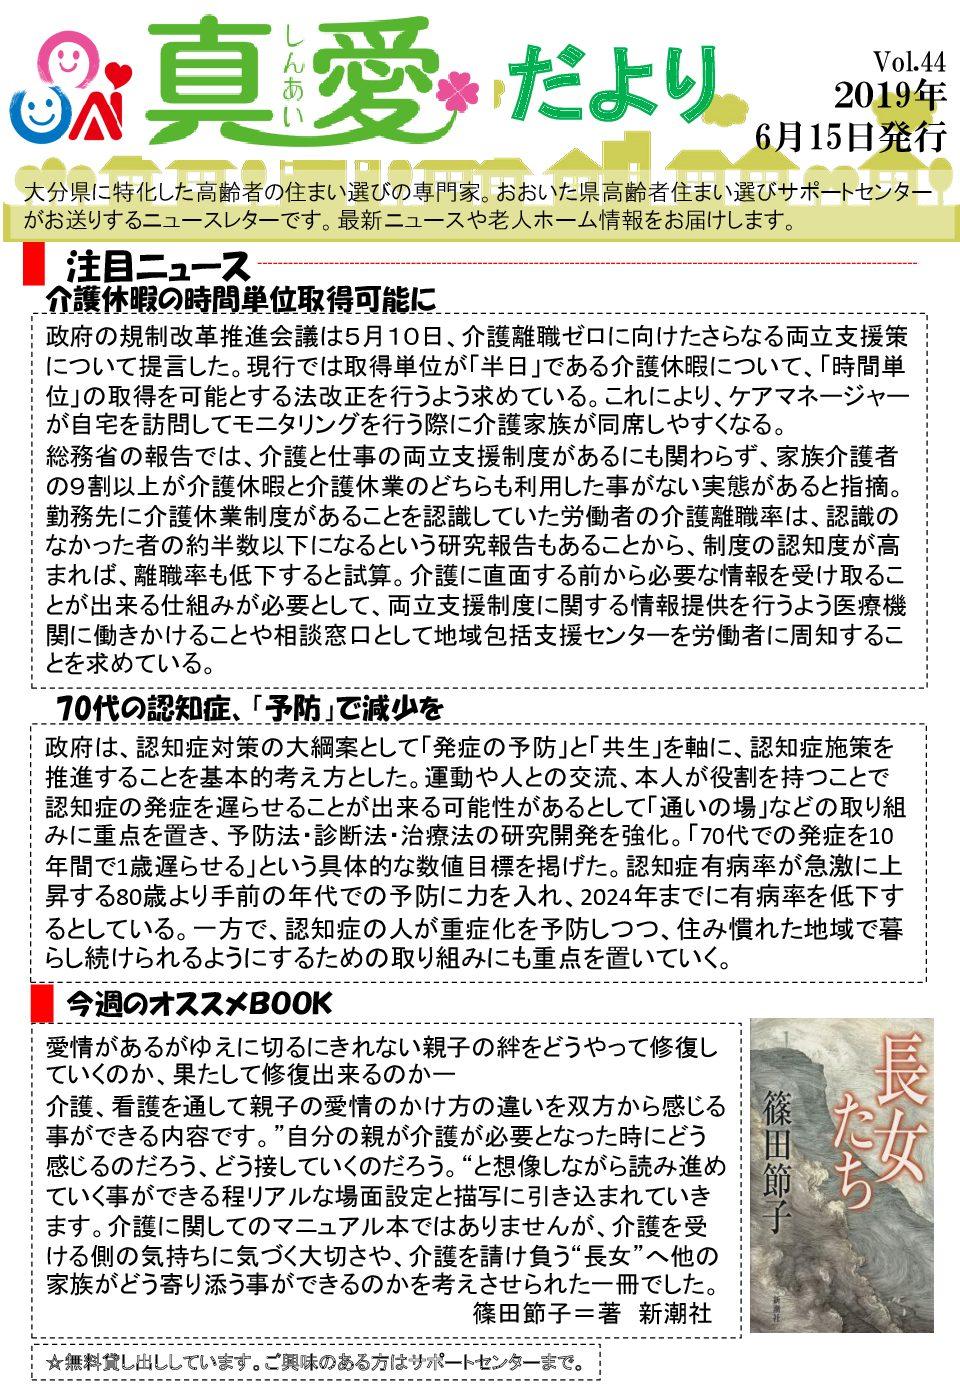 【Vol.44】 2019.06.15発行